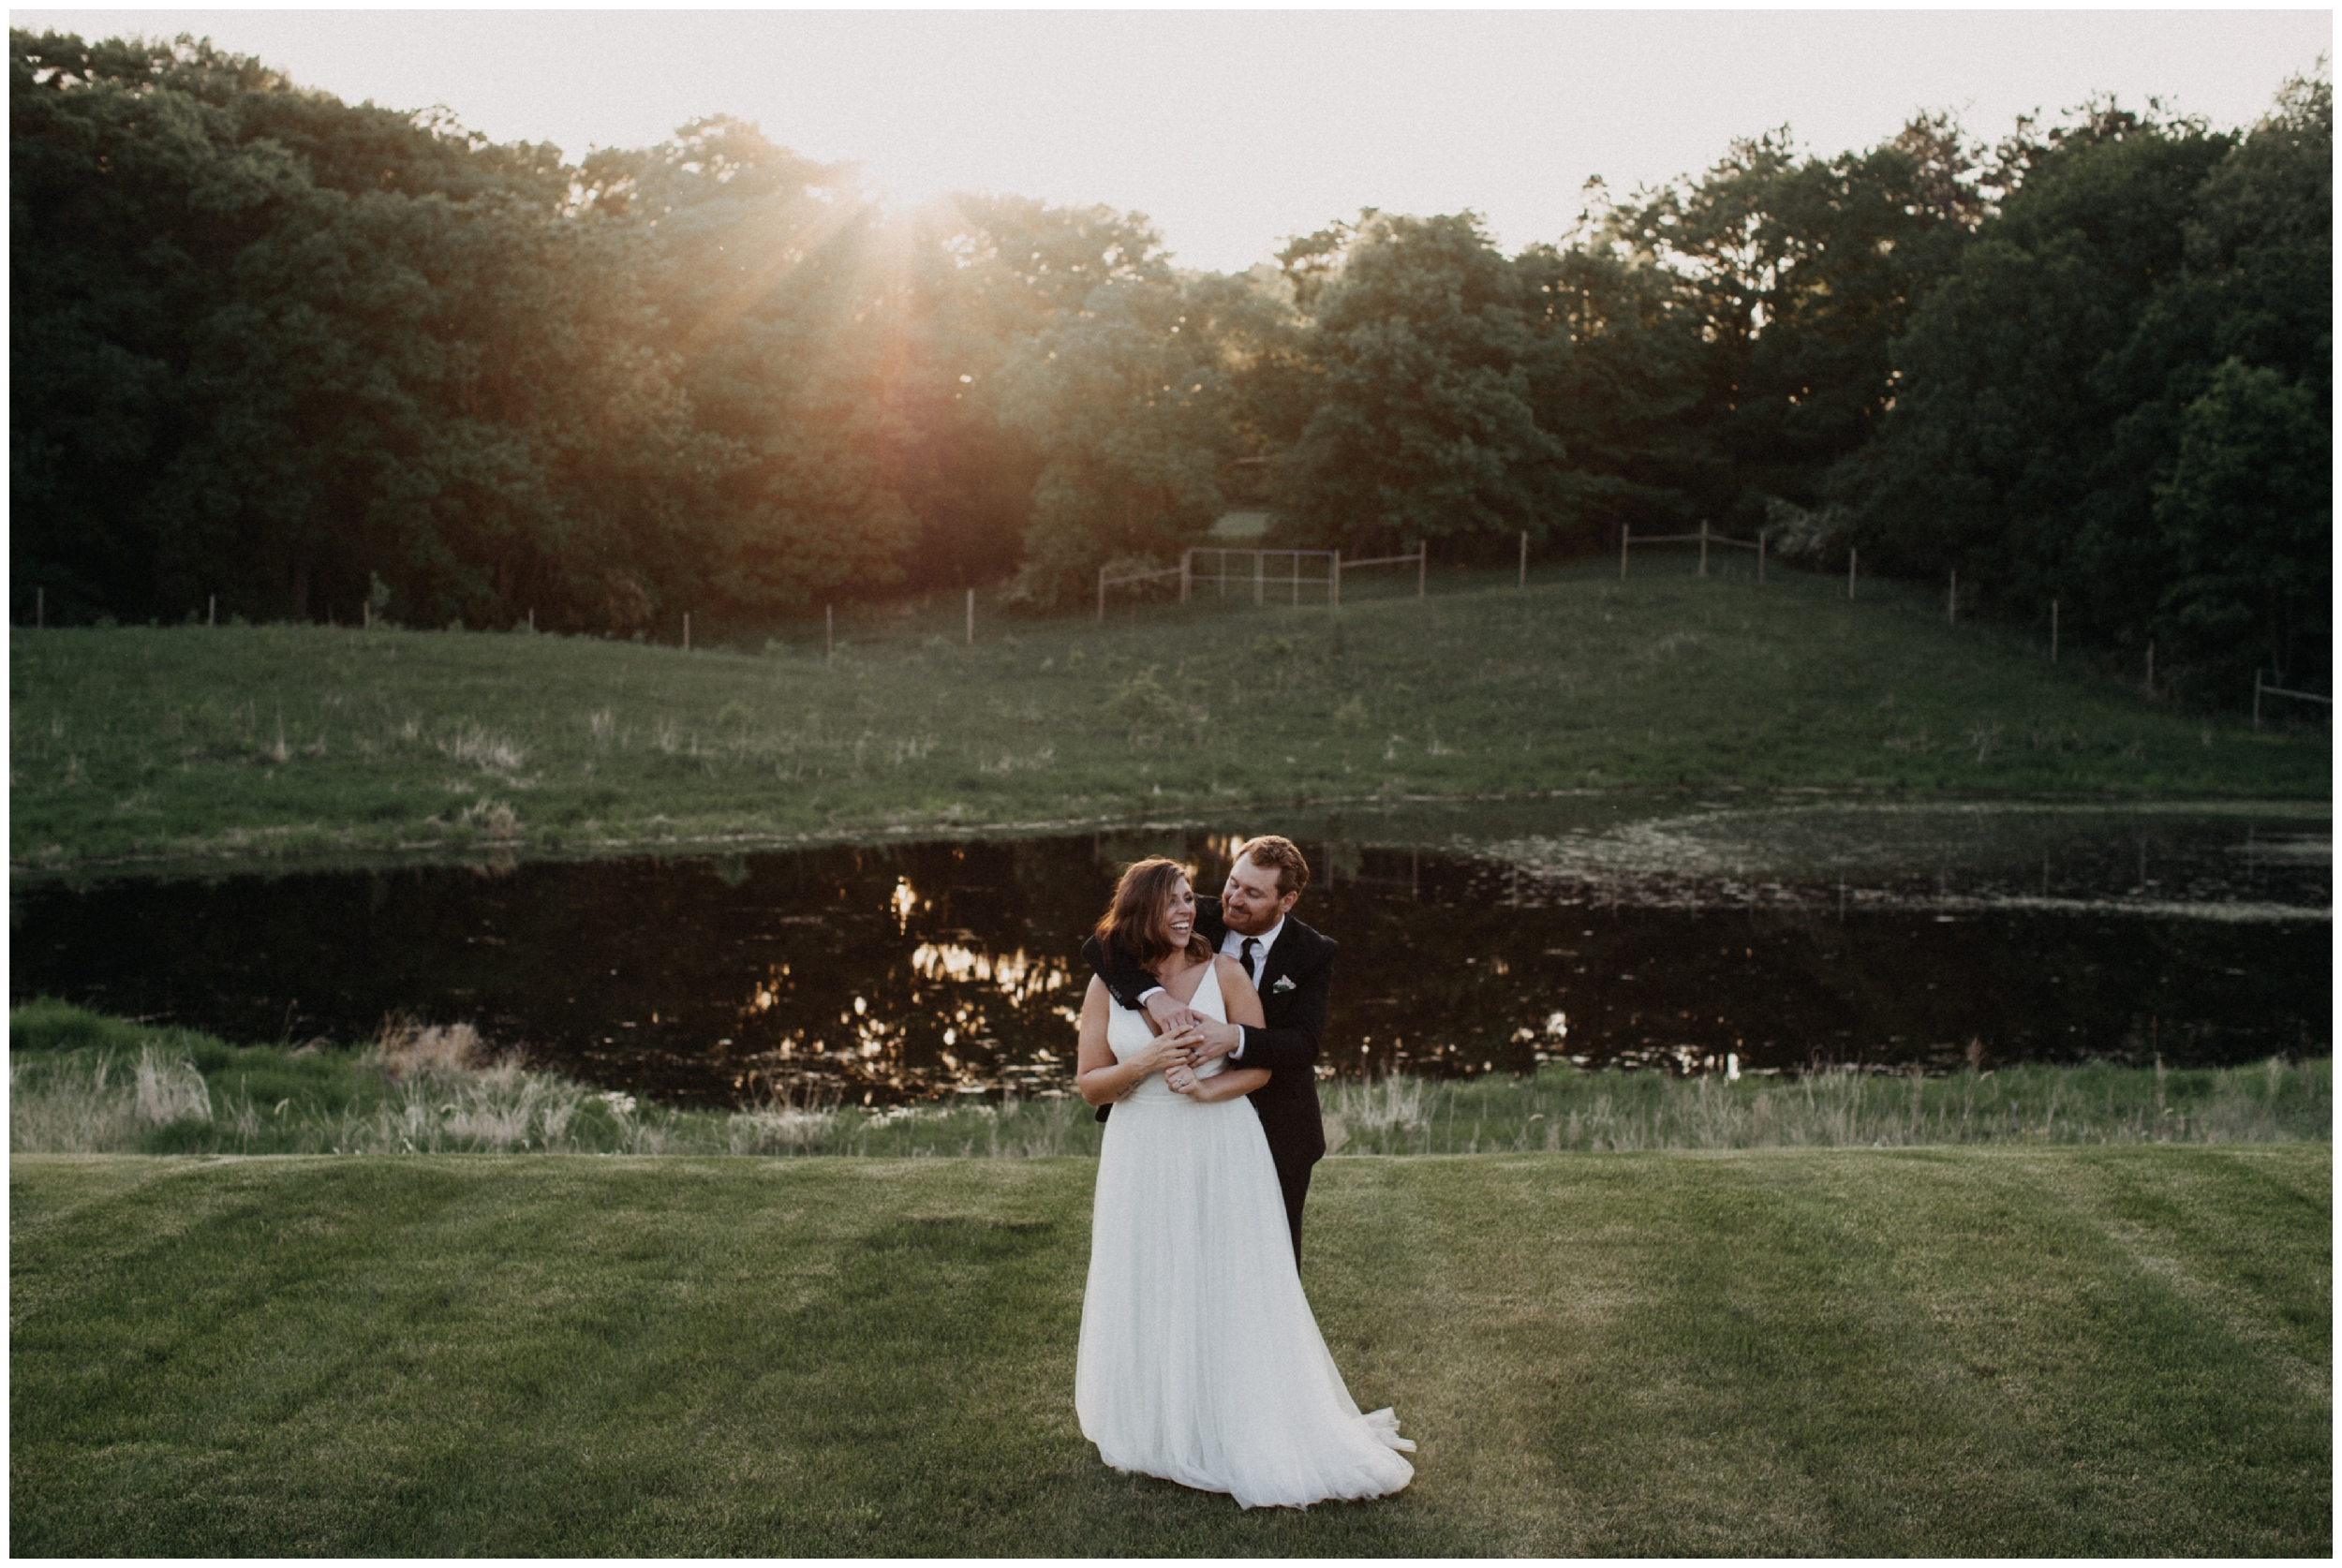 Minnesota winery wedding photographed by Britt DeZeeuw